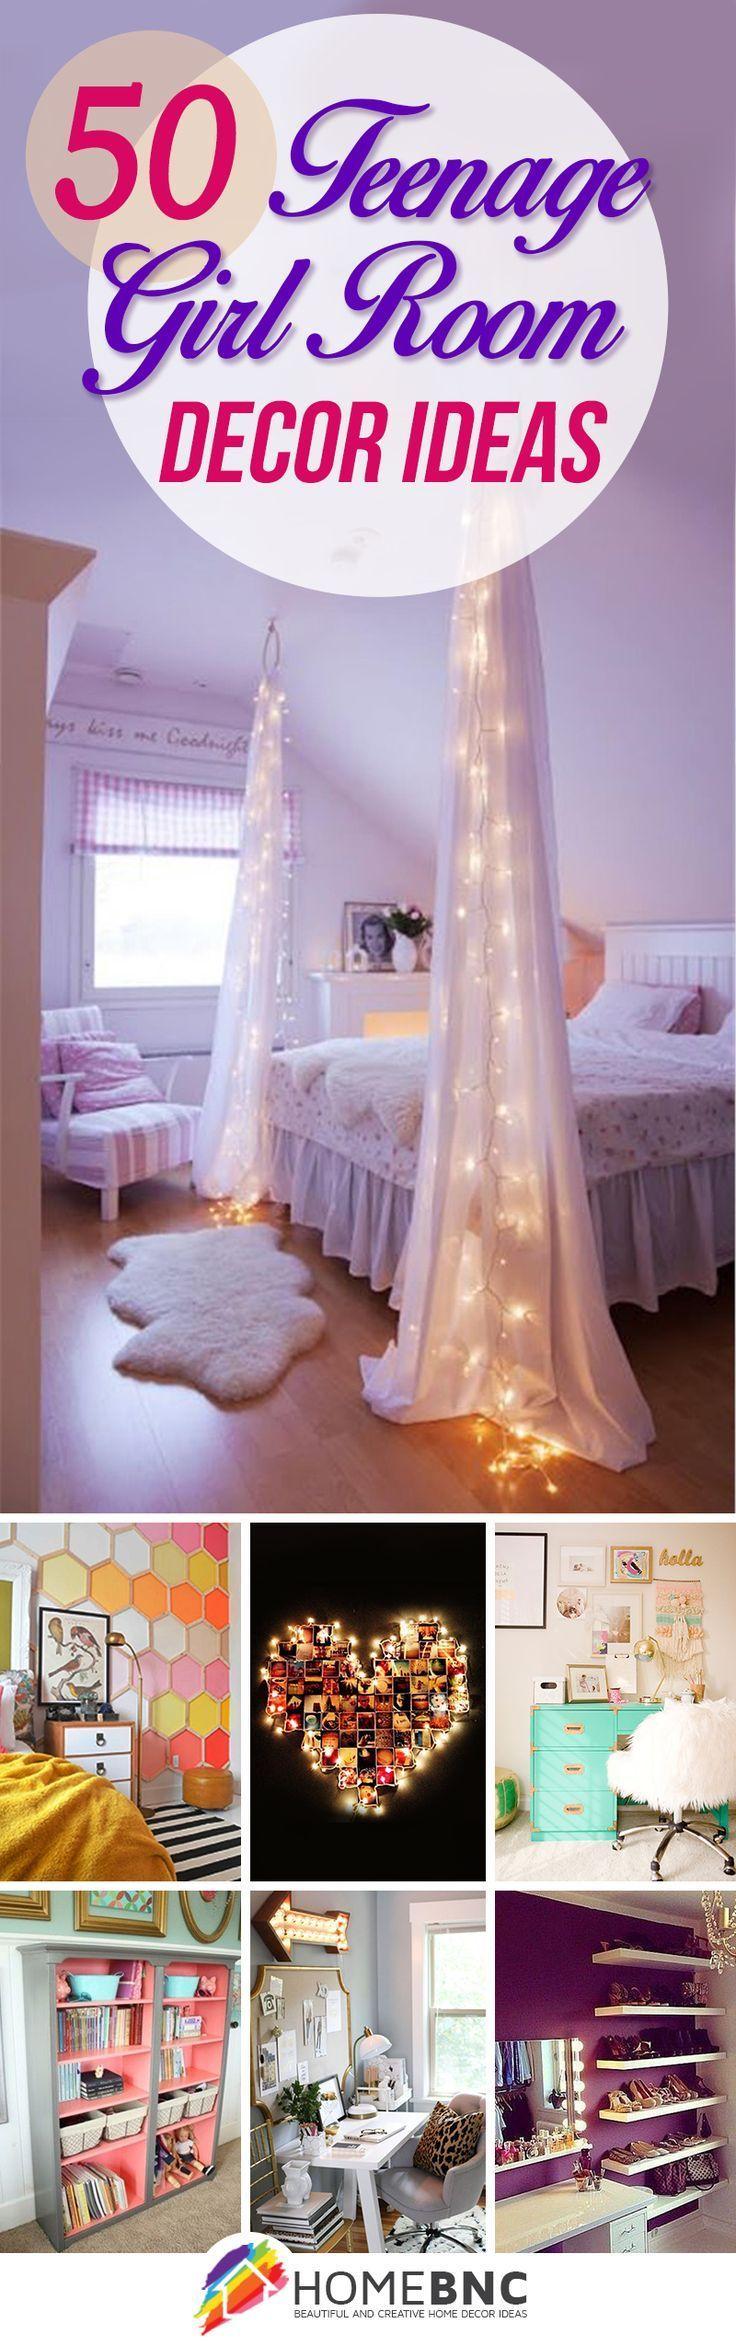 25+ best ideas about Girls room design on Pinterest   Teen bedroom ...